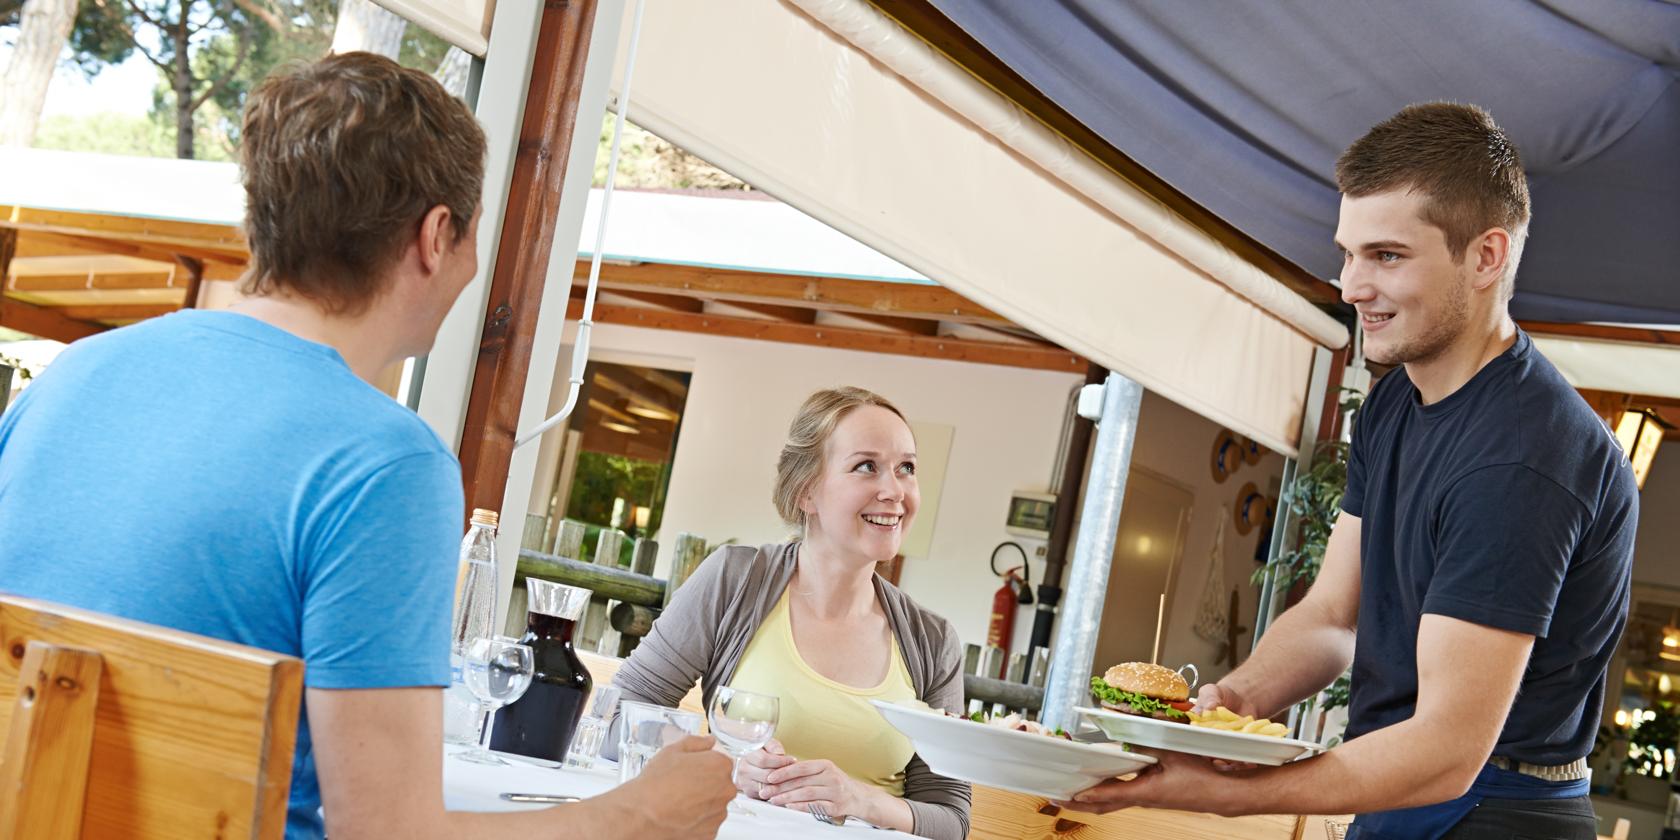 10-4 Customer Service Rule